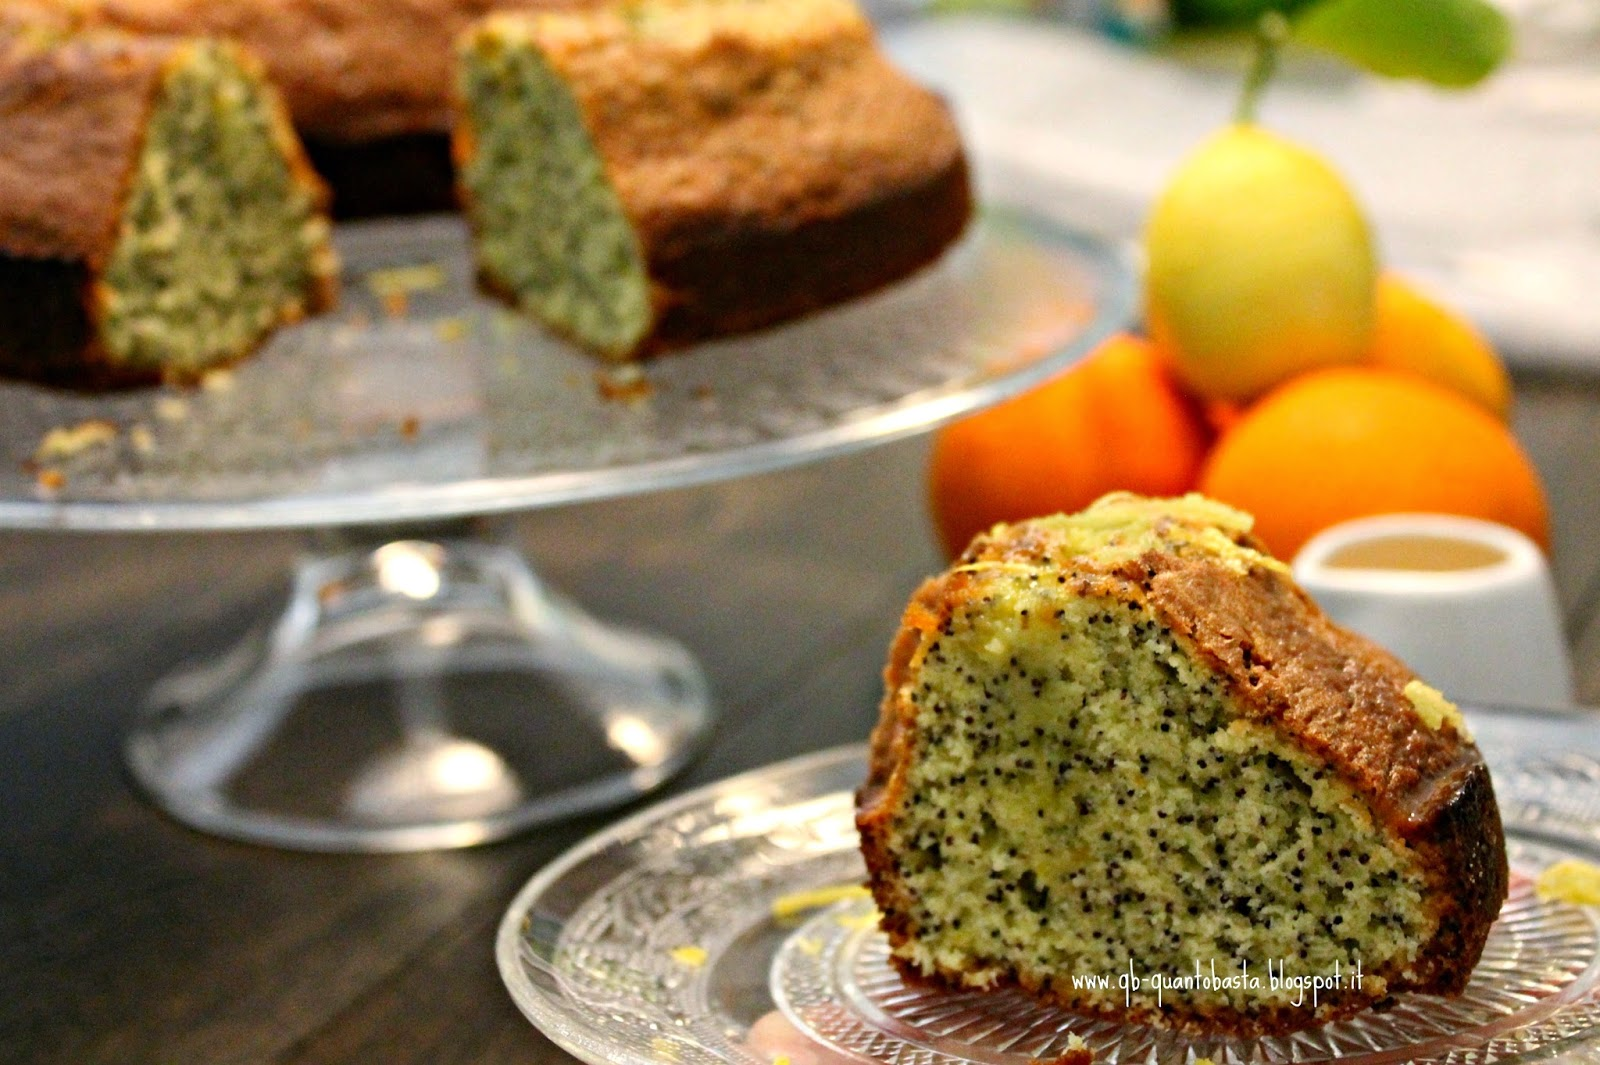 Q.b.-Quanto Basta.: Poppy Seed Citrus Cake - Torta ai semi di papavero